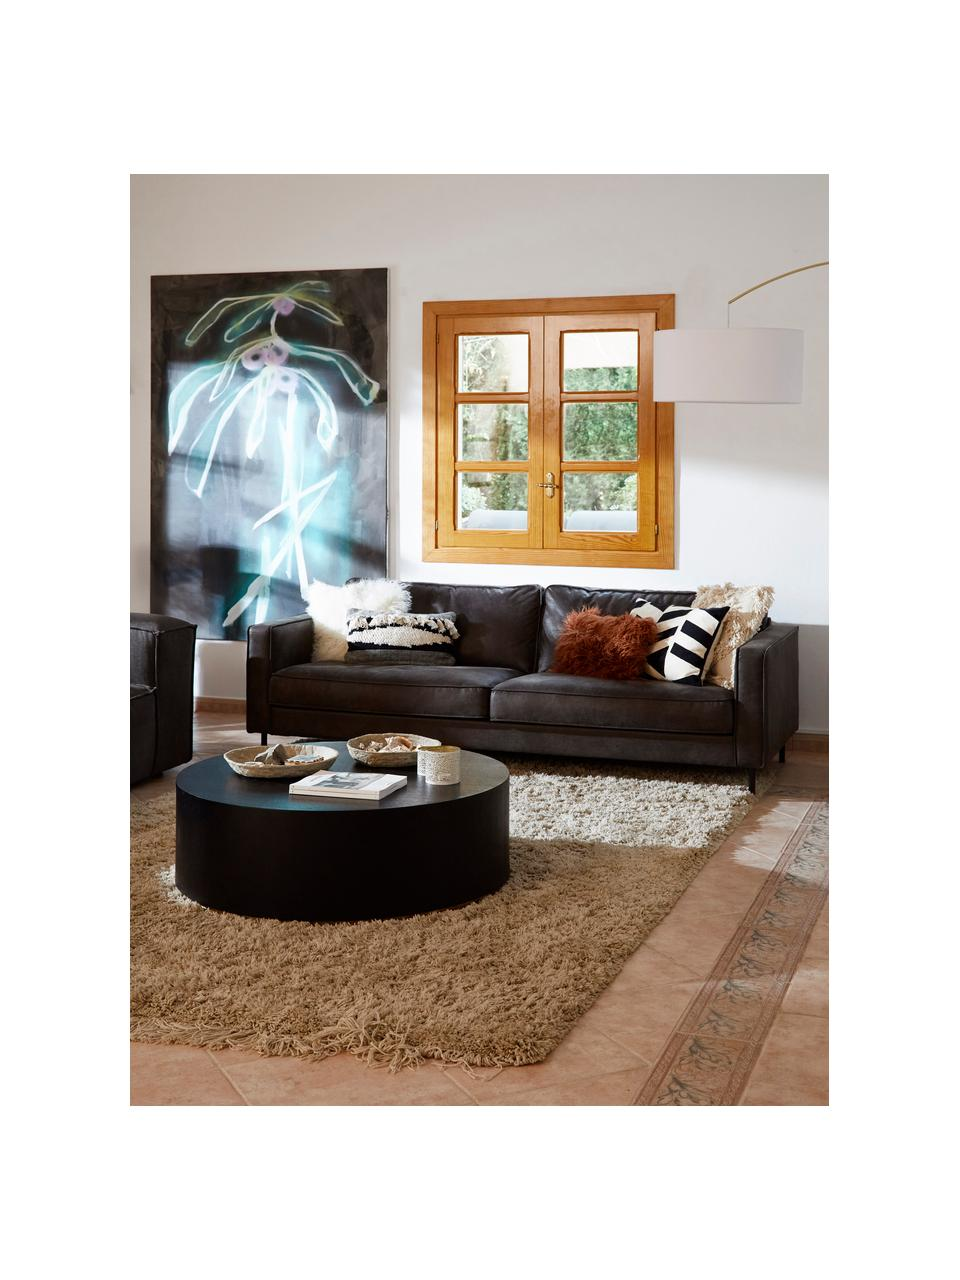 Sofa Hunter (3-Sitzer) in Braungrau aus recyceltem Leder, Bezug: Recyceltes Leder (70% Led, Gestell: Massives Birkenholz und h, Füße: Metall, pulverbeschichtet, Leder Braungrau, B 219 x T 90 cm